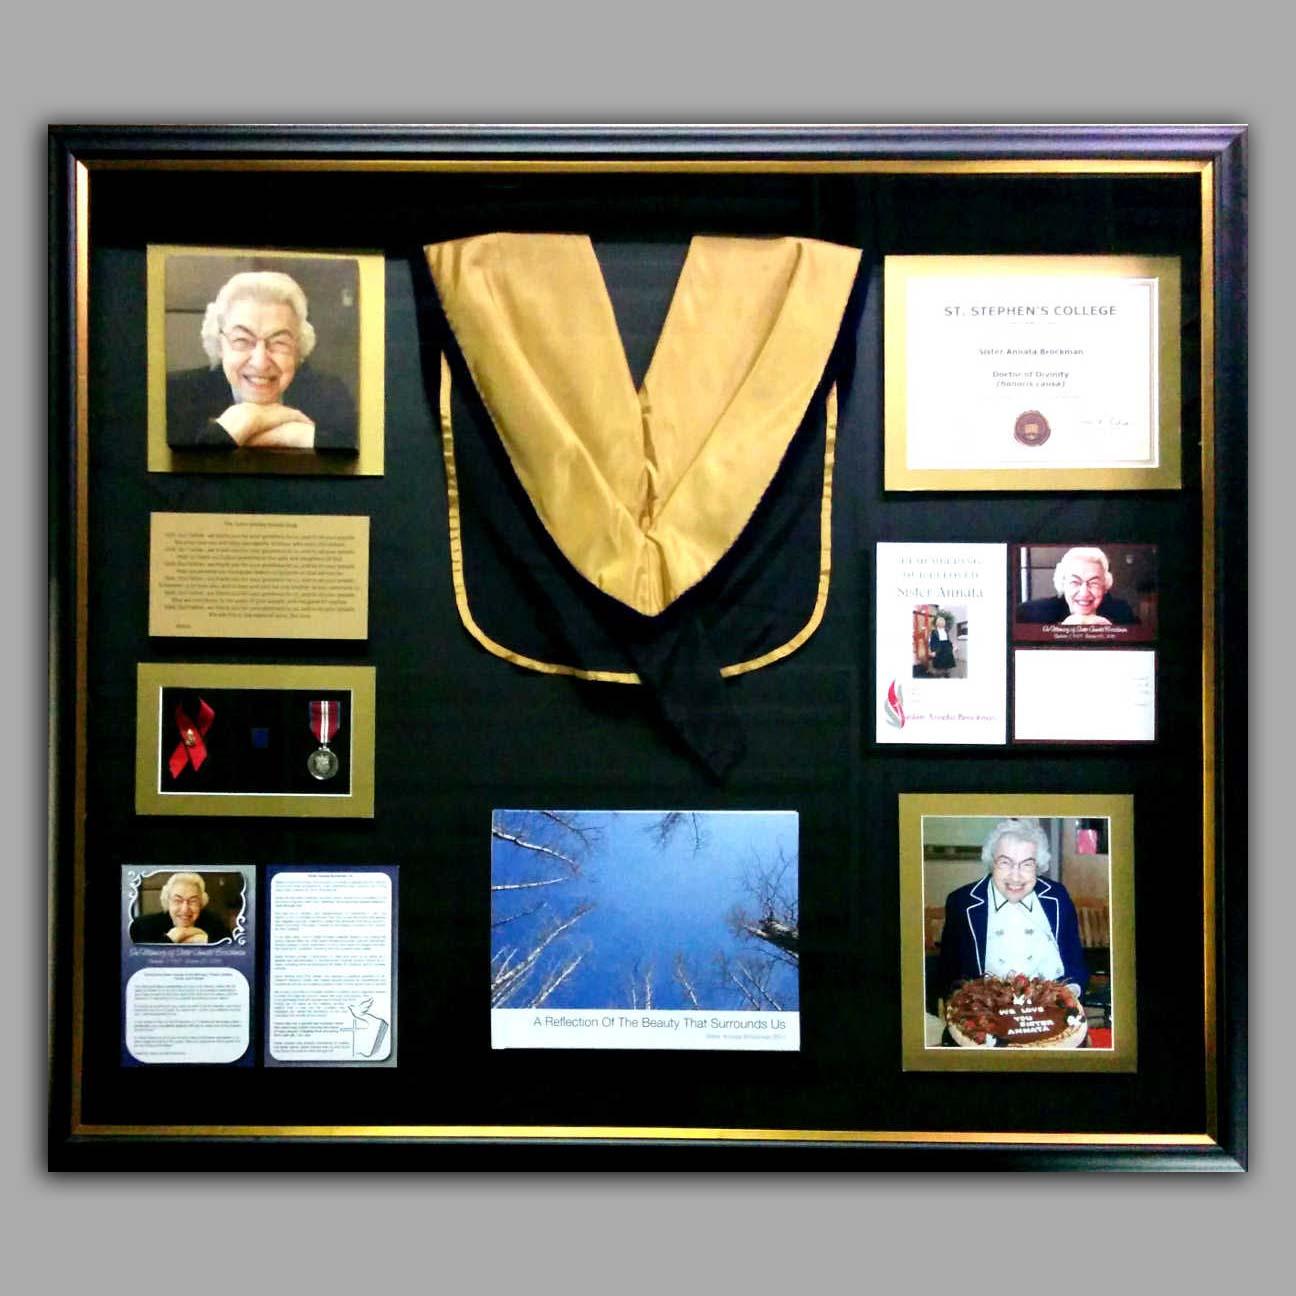 Picture Framing Example - Sister Annatta College